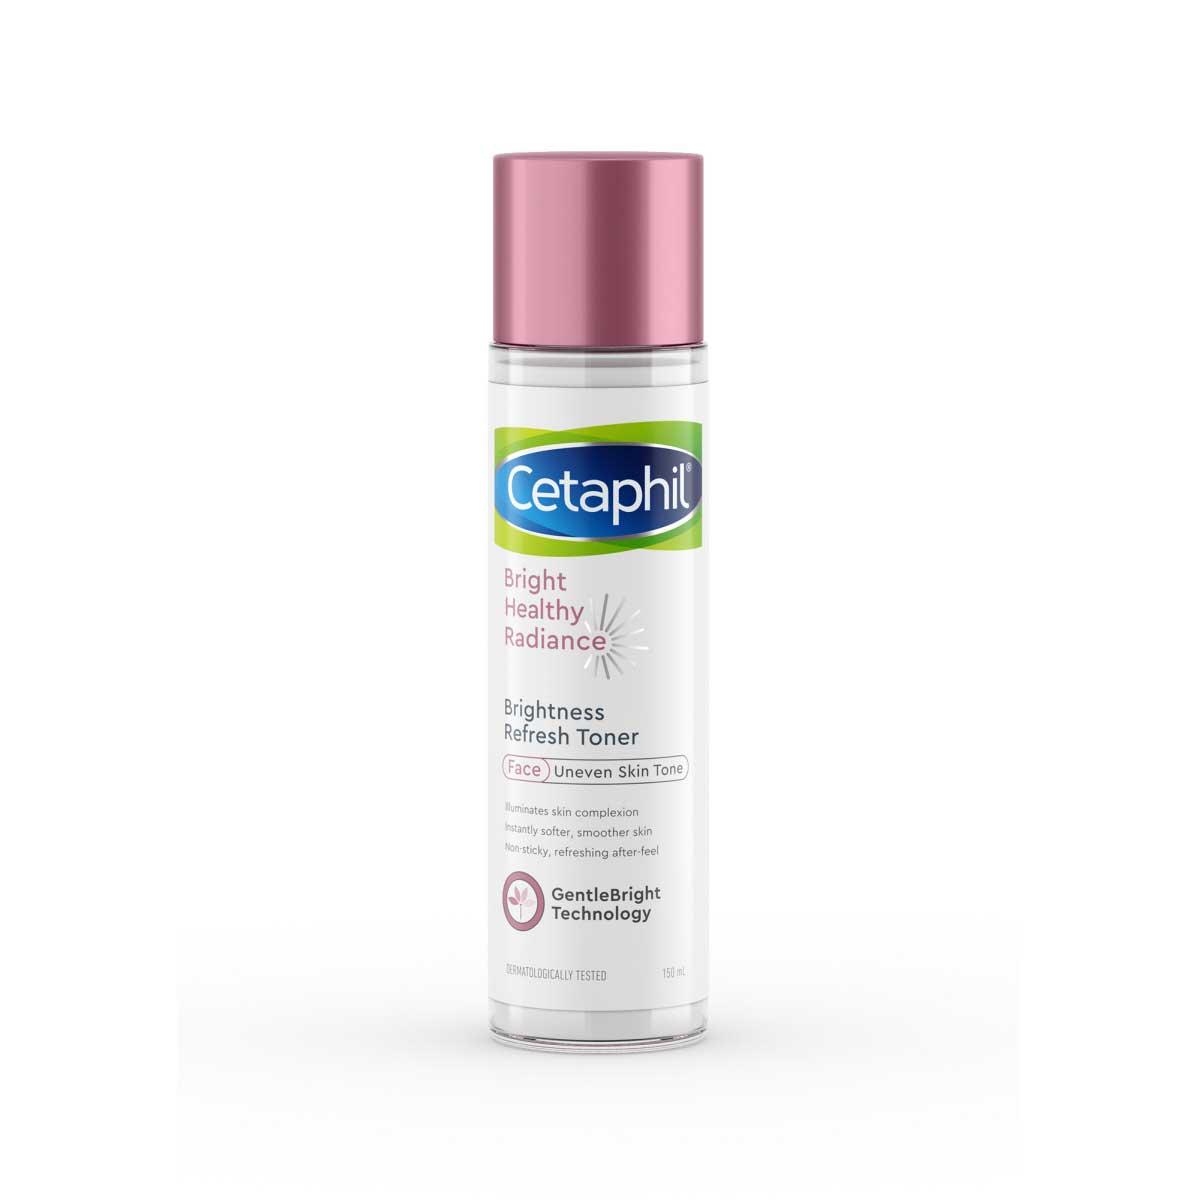 Cetaphil Bright Healthy Radiance Brightness Refresh Toner 150ml